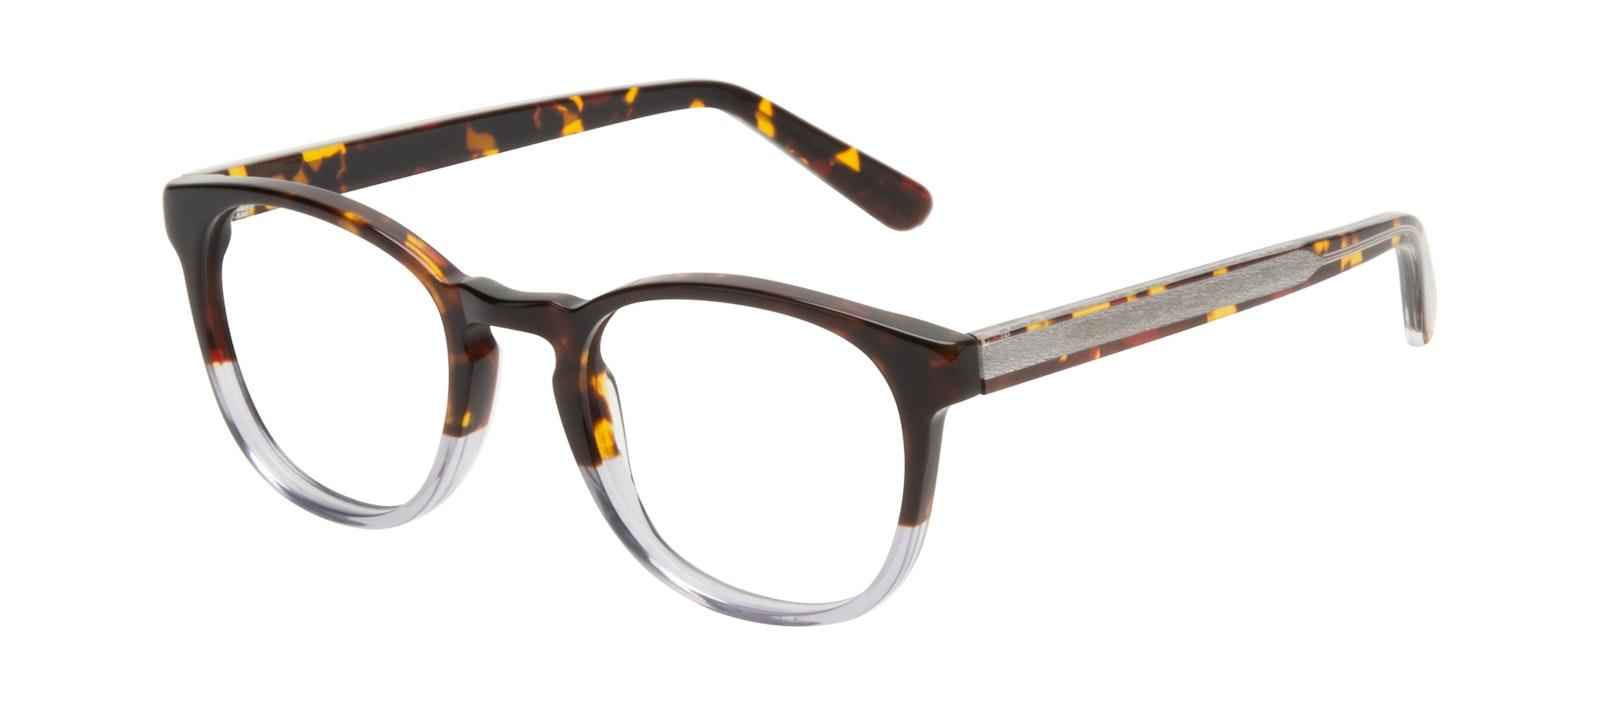 Affordable Fashion Glasses Round Eyeglasses Men Boreal Pacific Tilt